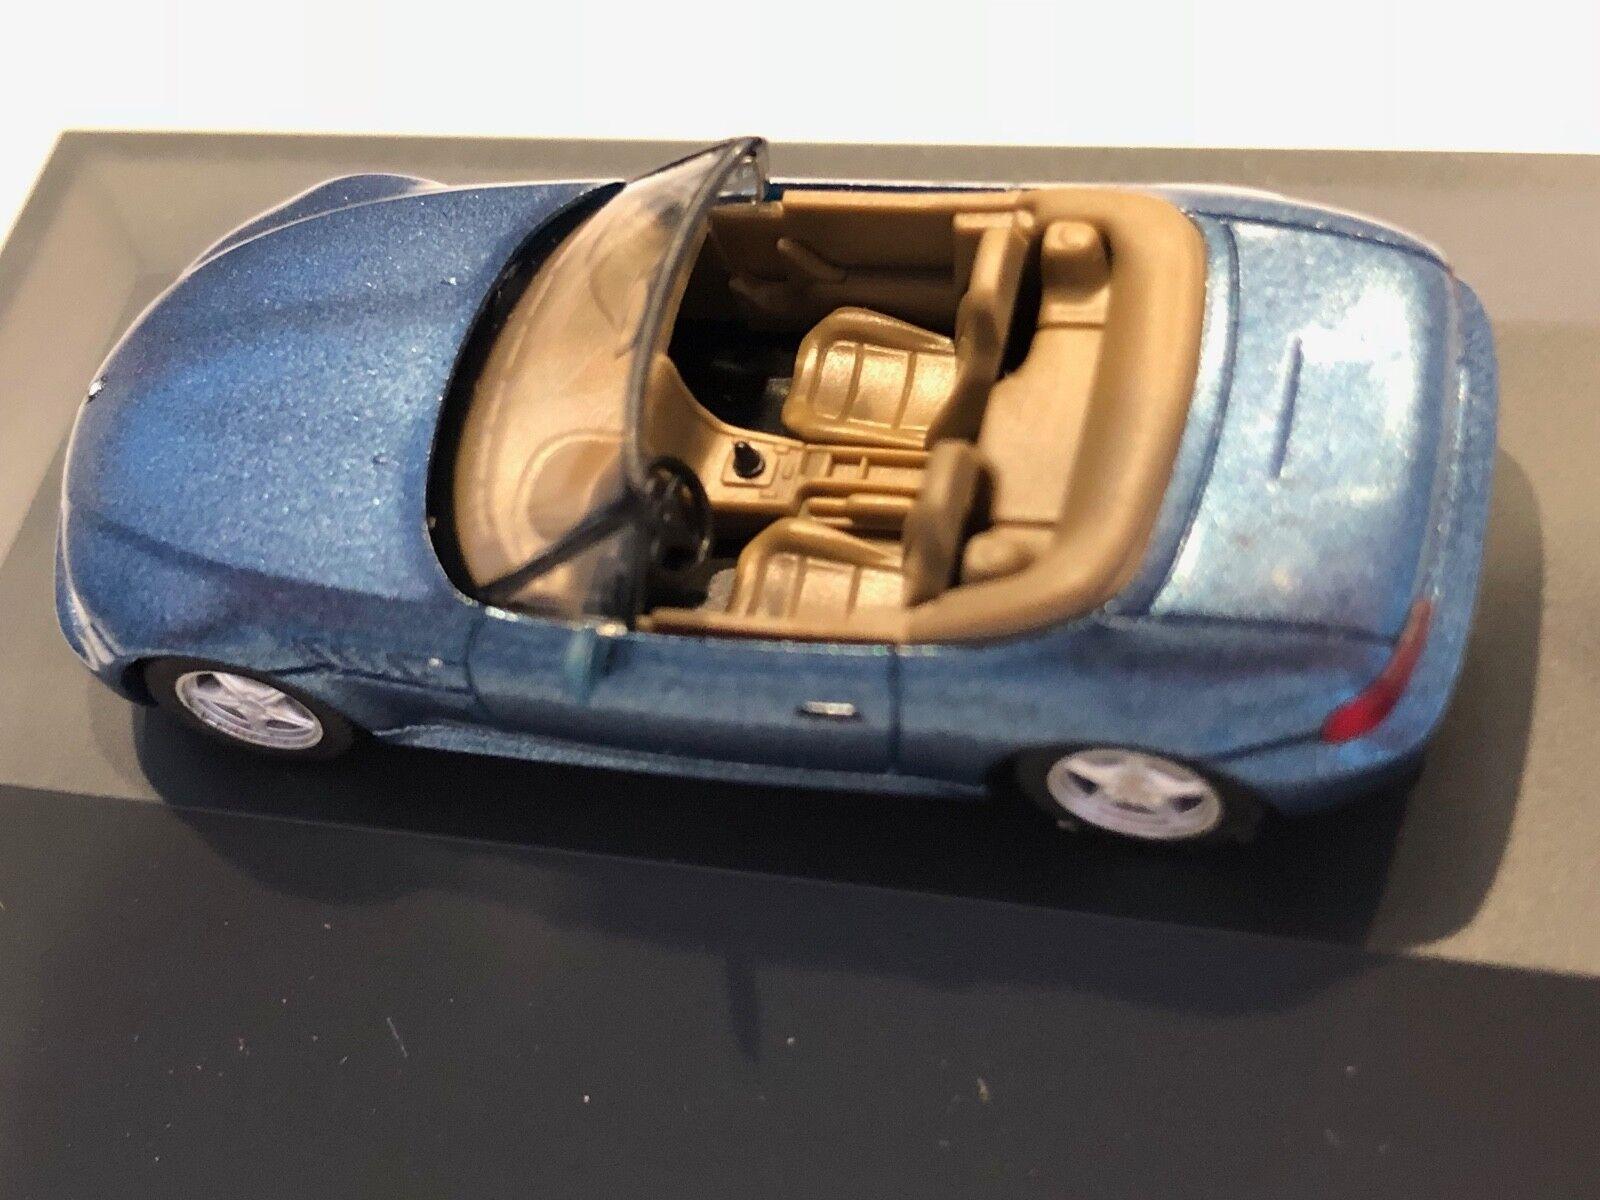 BMW Z3 roadster oreneye Limited Edition Herpa 1 87  Part   80 41 9 421 163  le plus en vogue